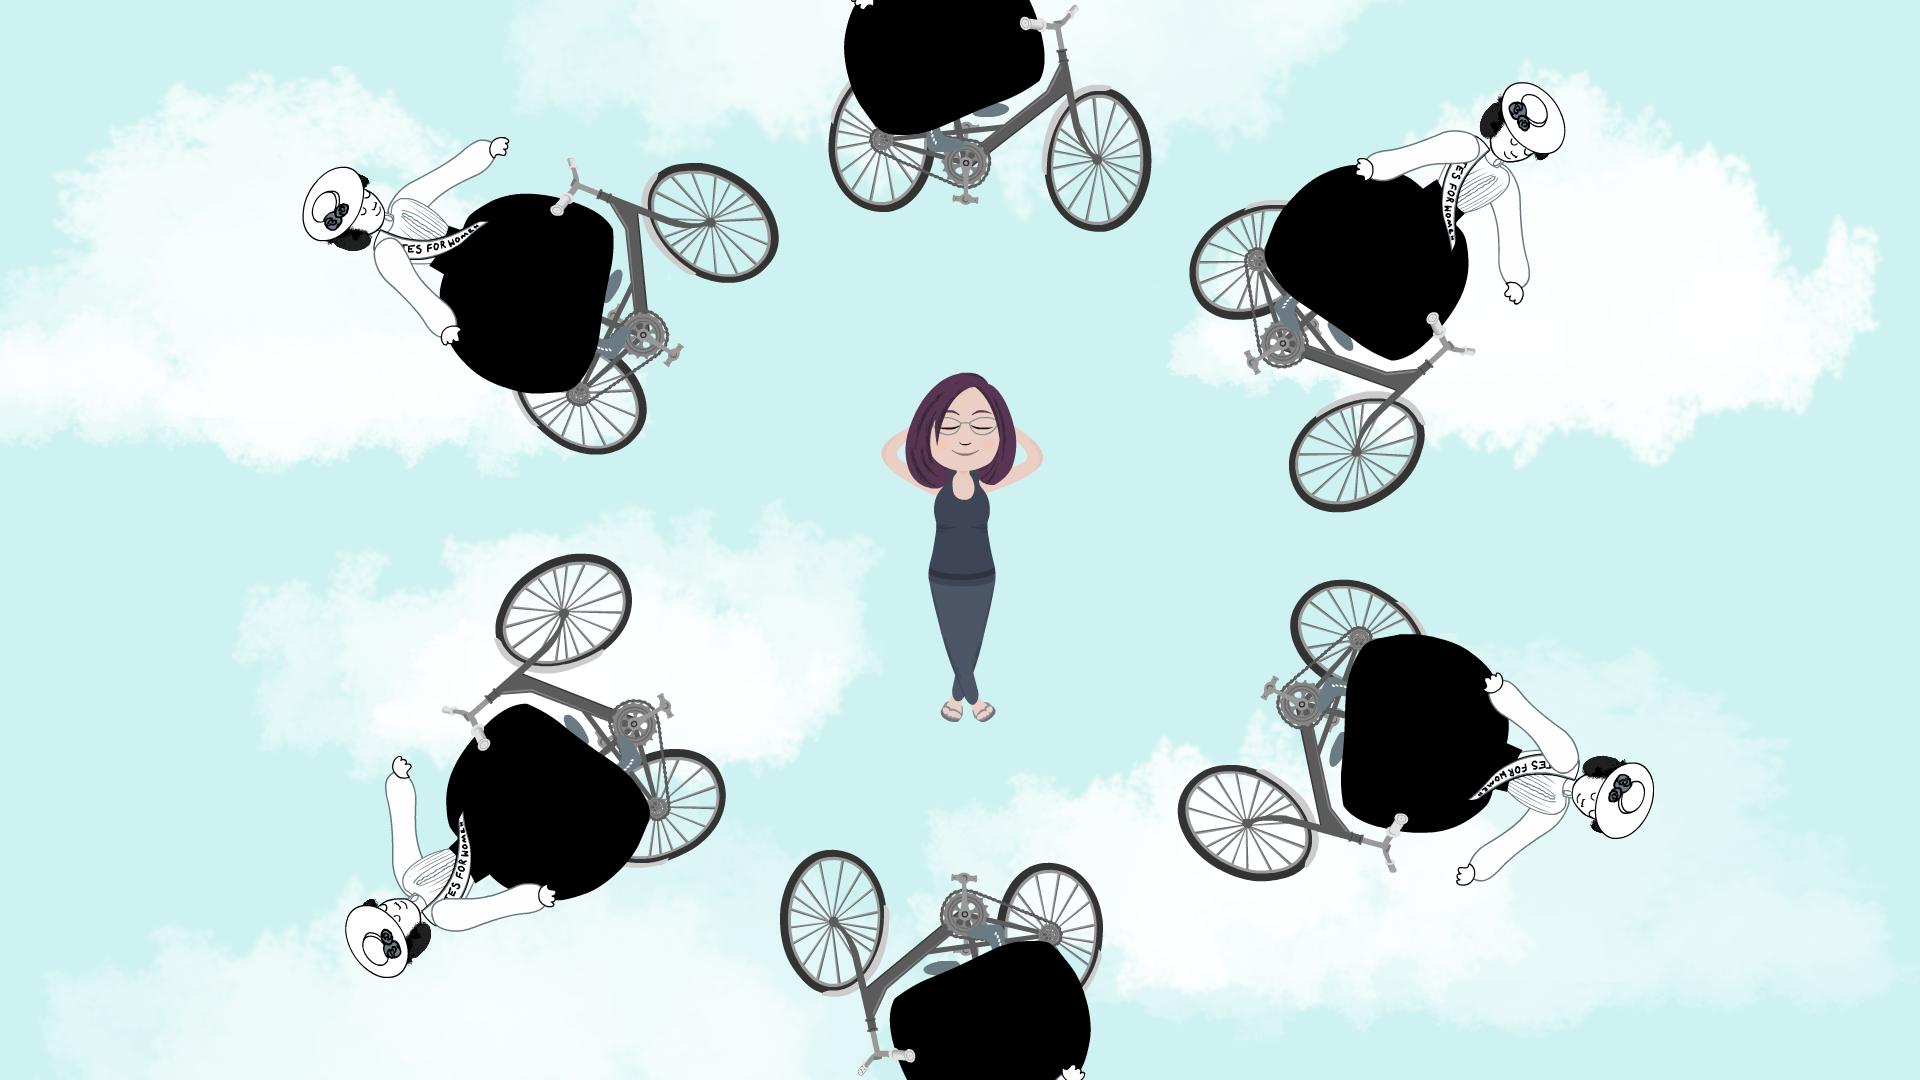 A Girl Needs a Bike_v02.00_00_42_04.Still006.png